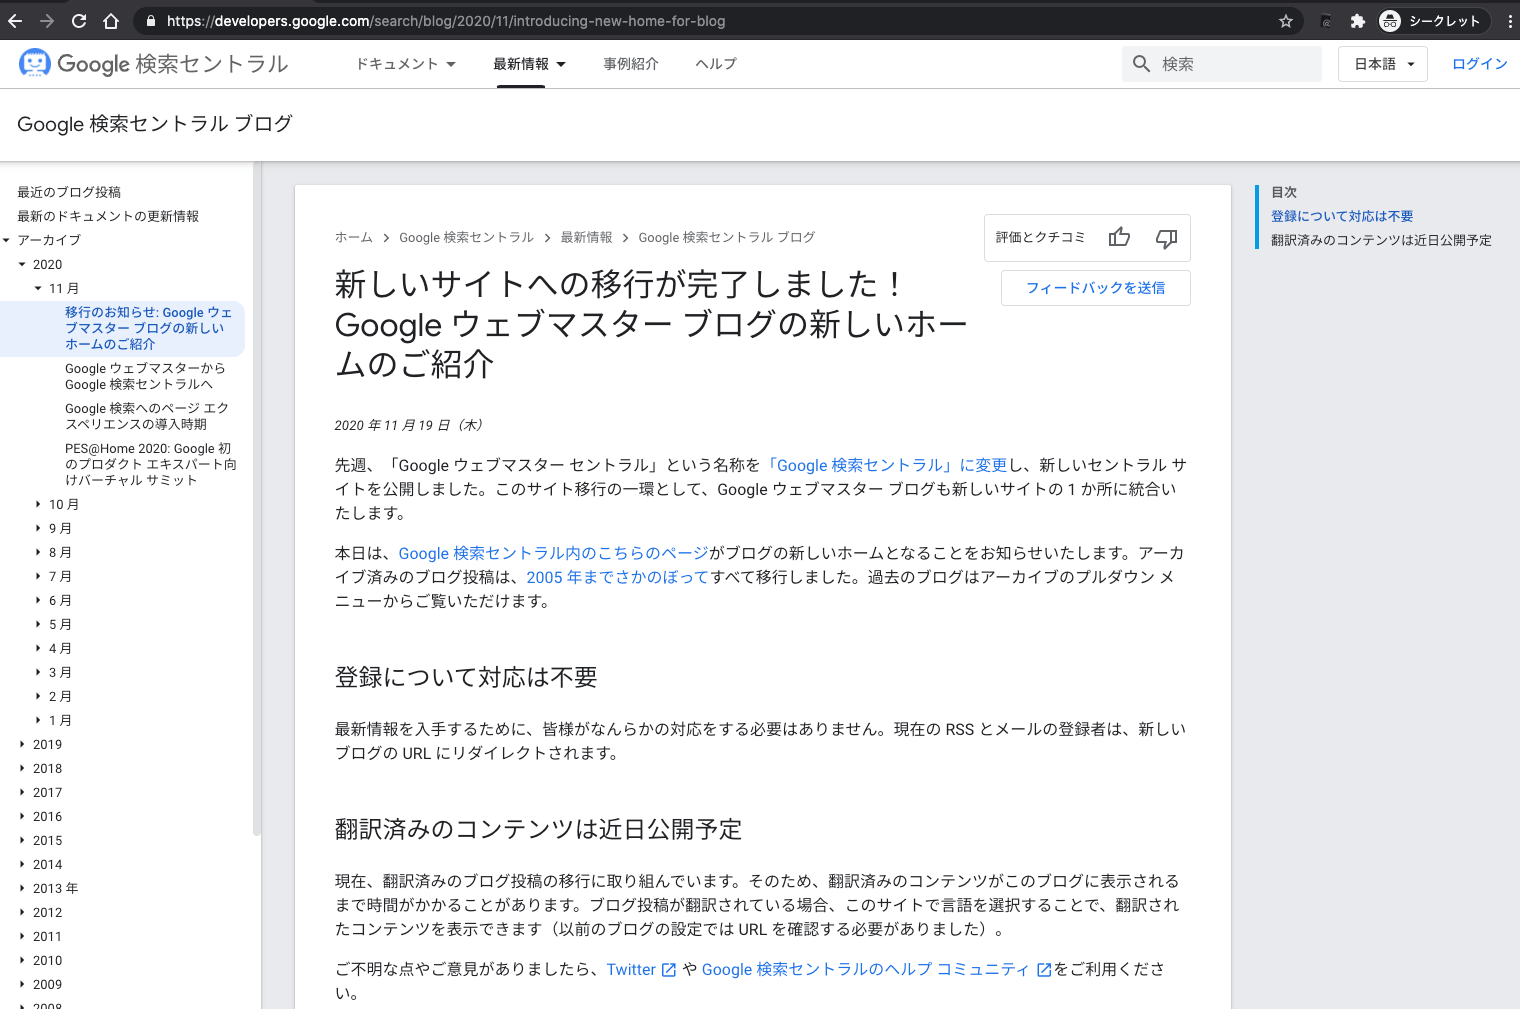 Google 検索セントラル ブログ